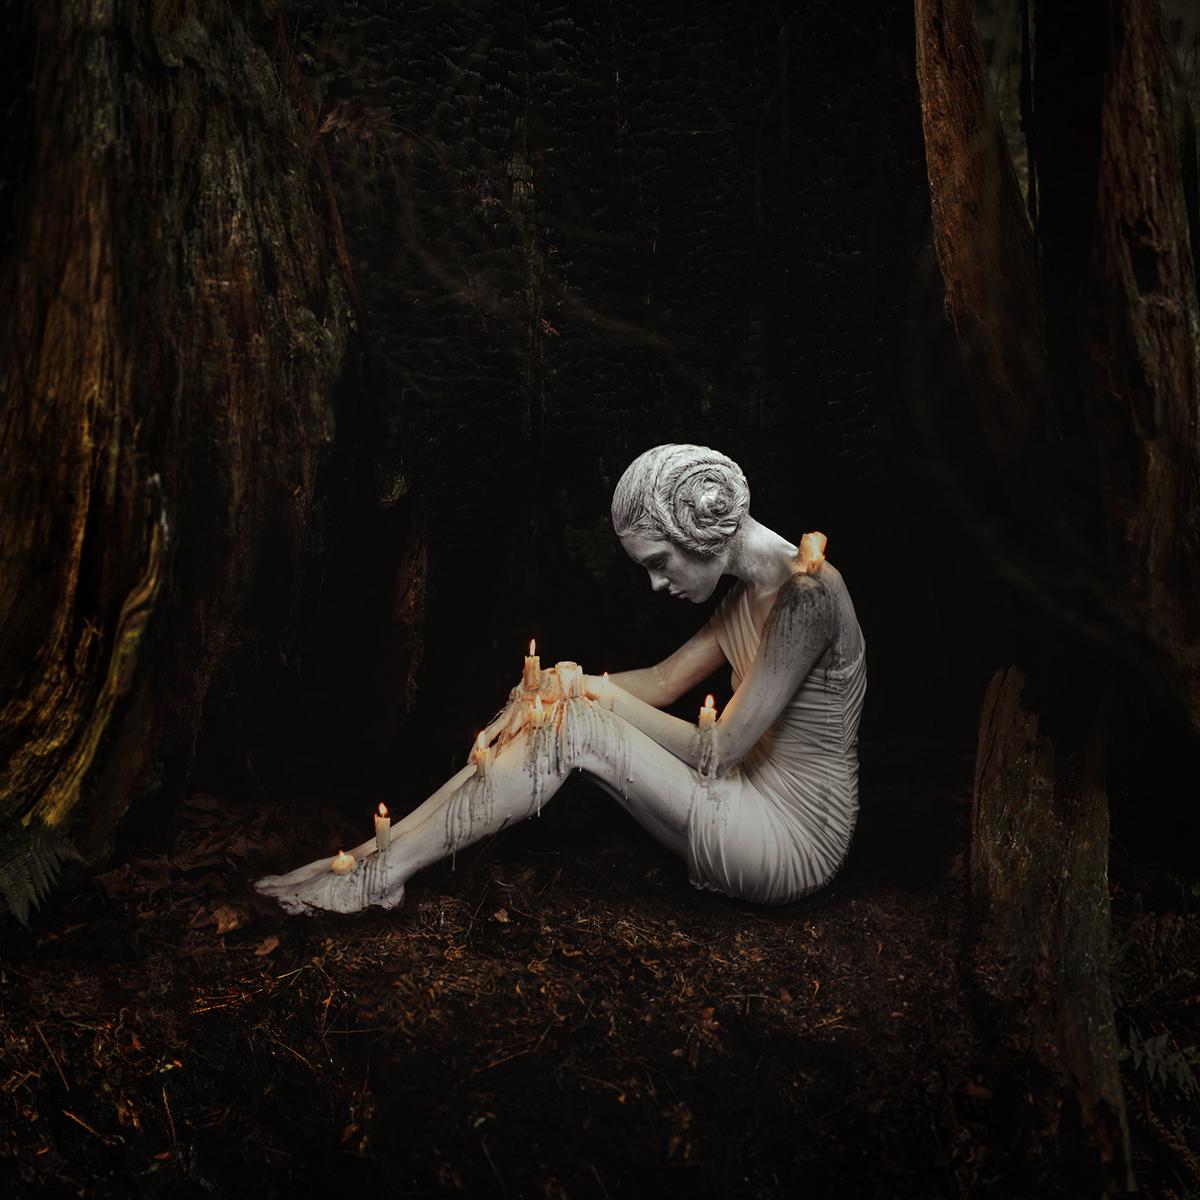 Kindra-Nikole-Photography-Casstronaut-Sleeper